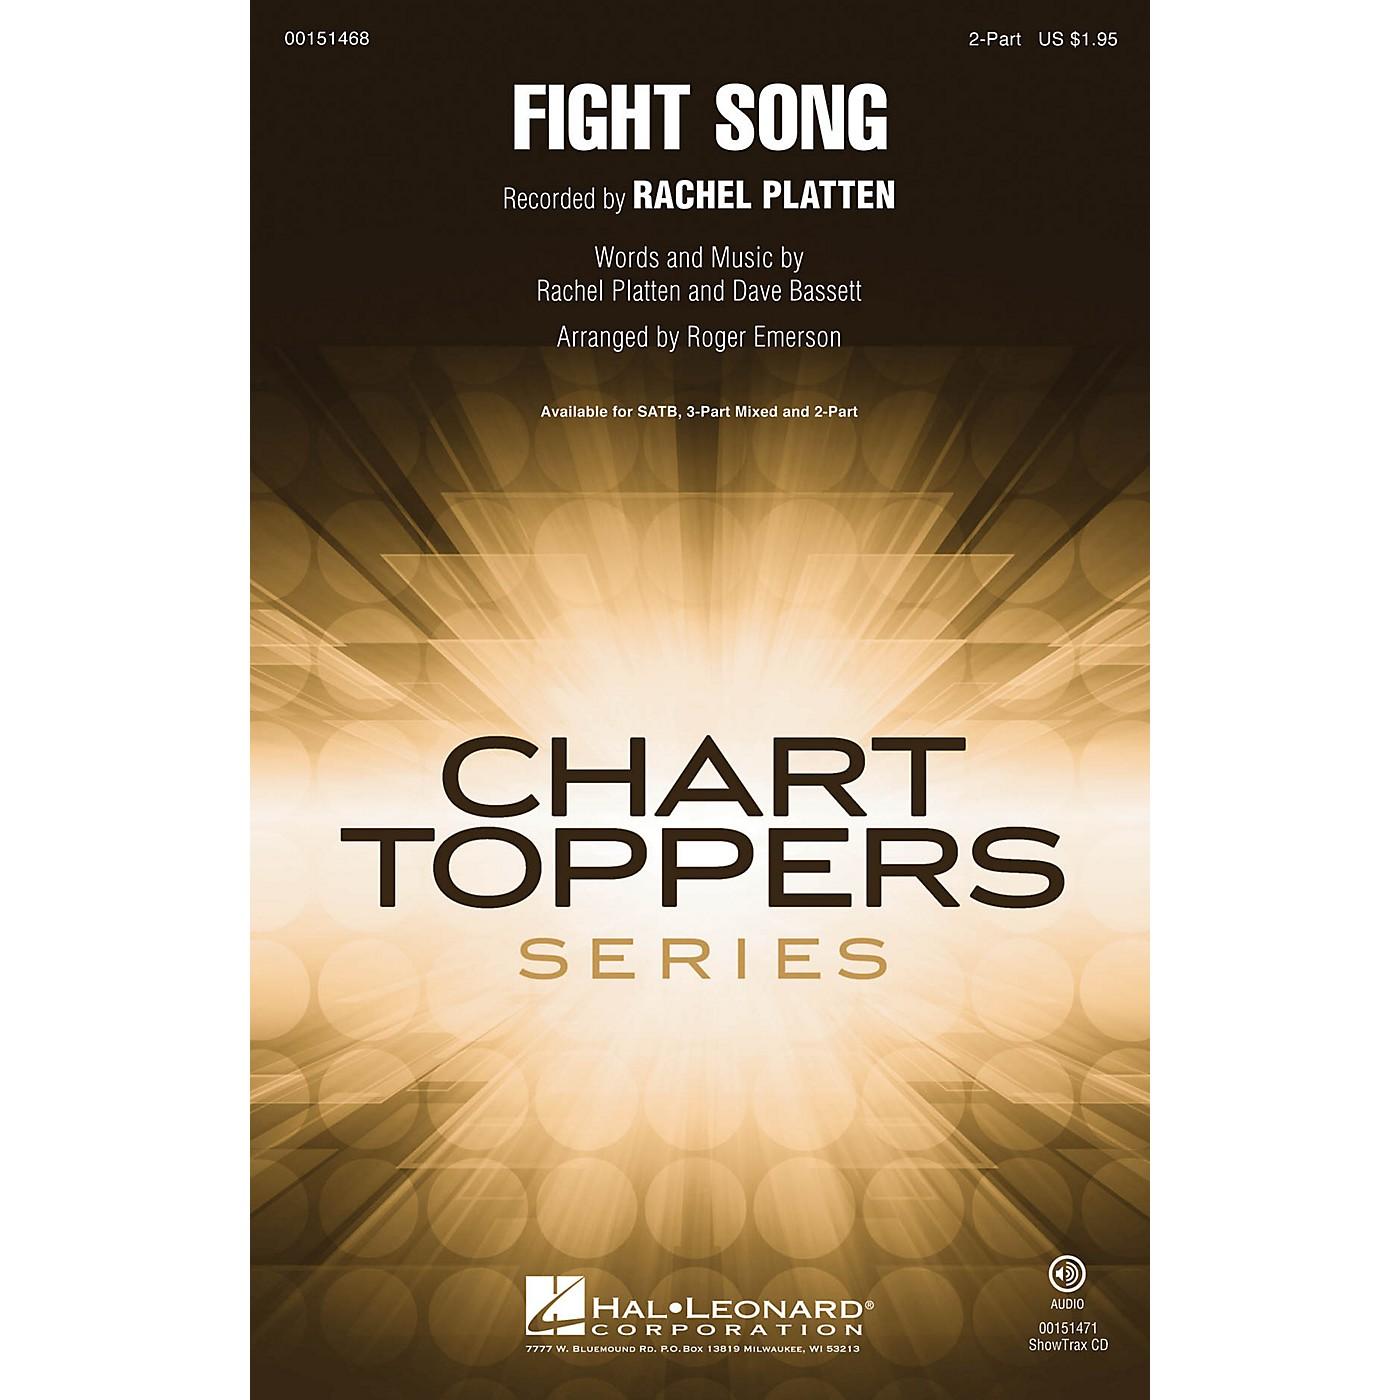 Hal Leonard Fight Song 2-Part by Rachel Platten arranged by Roger Emerson thumbnail